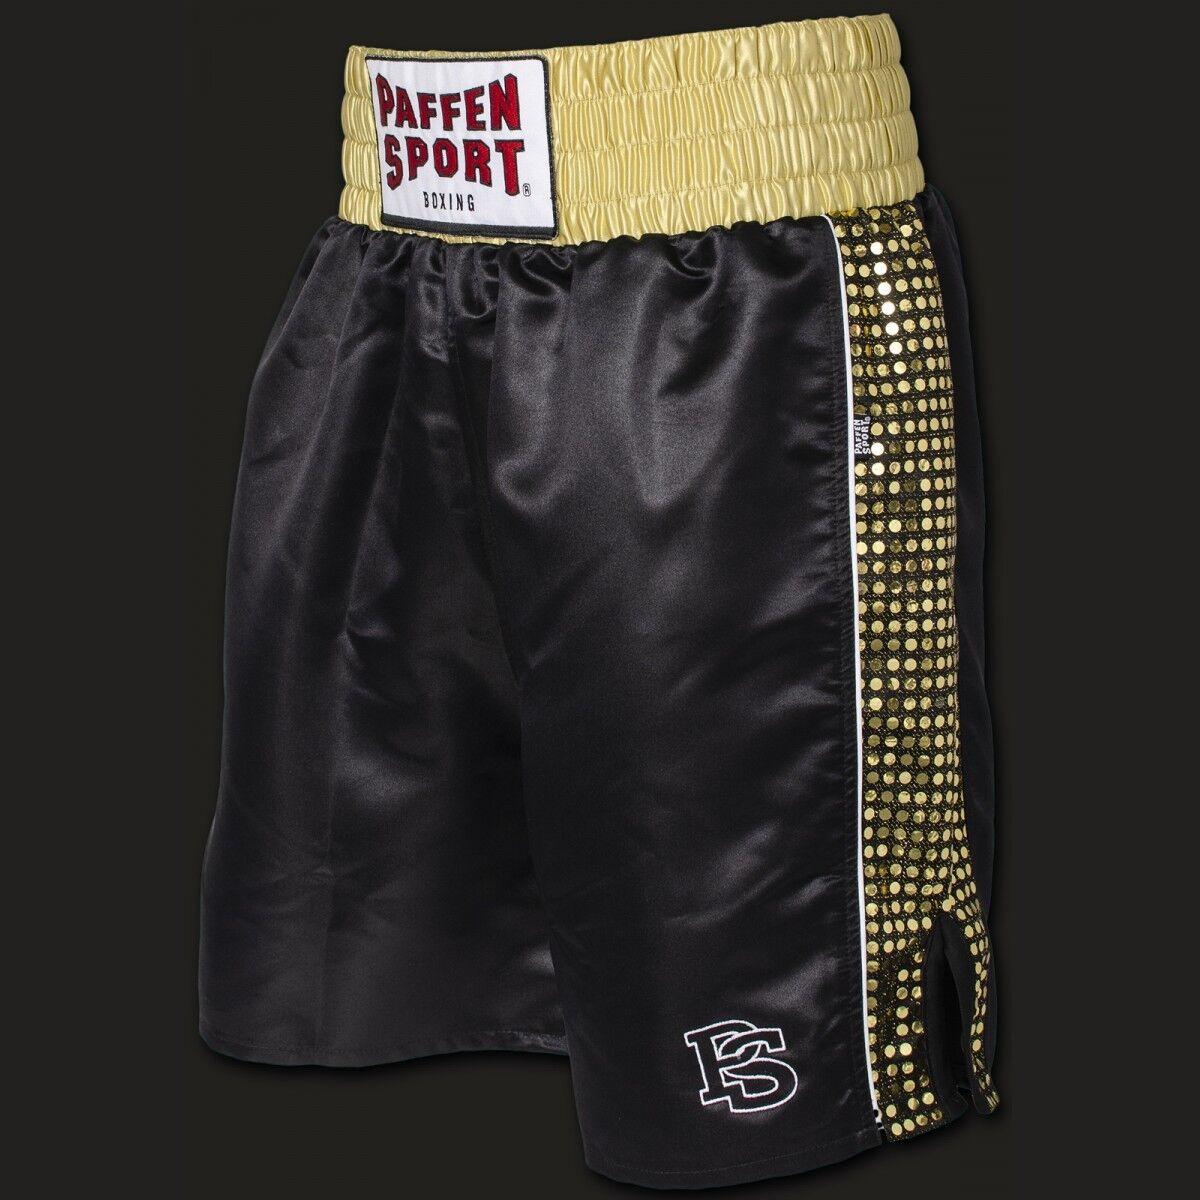 Pro Glory Profi Boxerhose Schwarz Gold. Gold. Gold. Gr. S - XXL, Wettkampf. Training. Boxen    Ausgezeichnet  0013d5